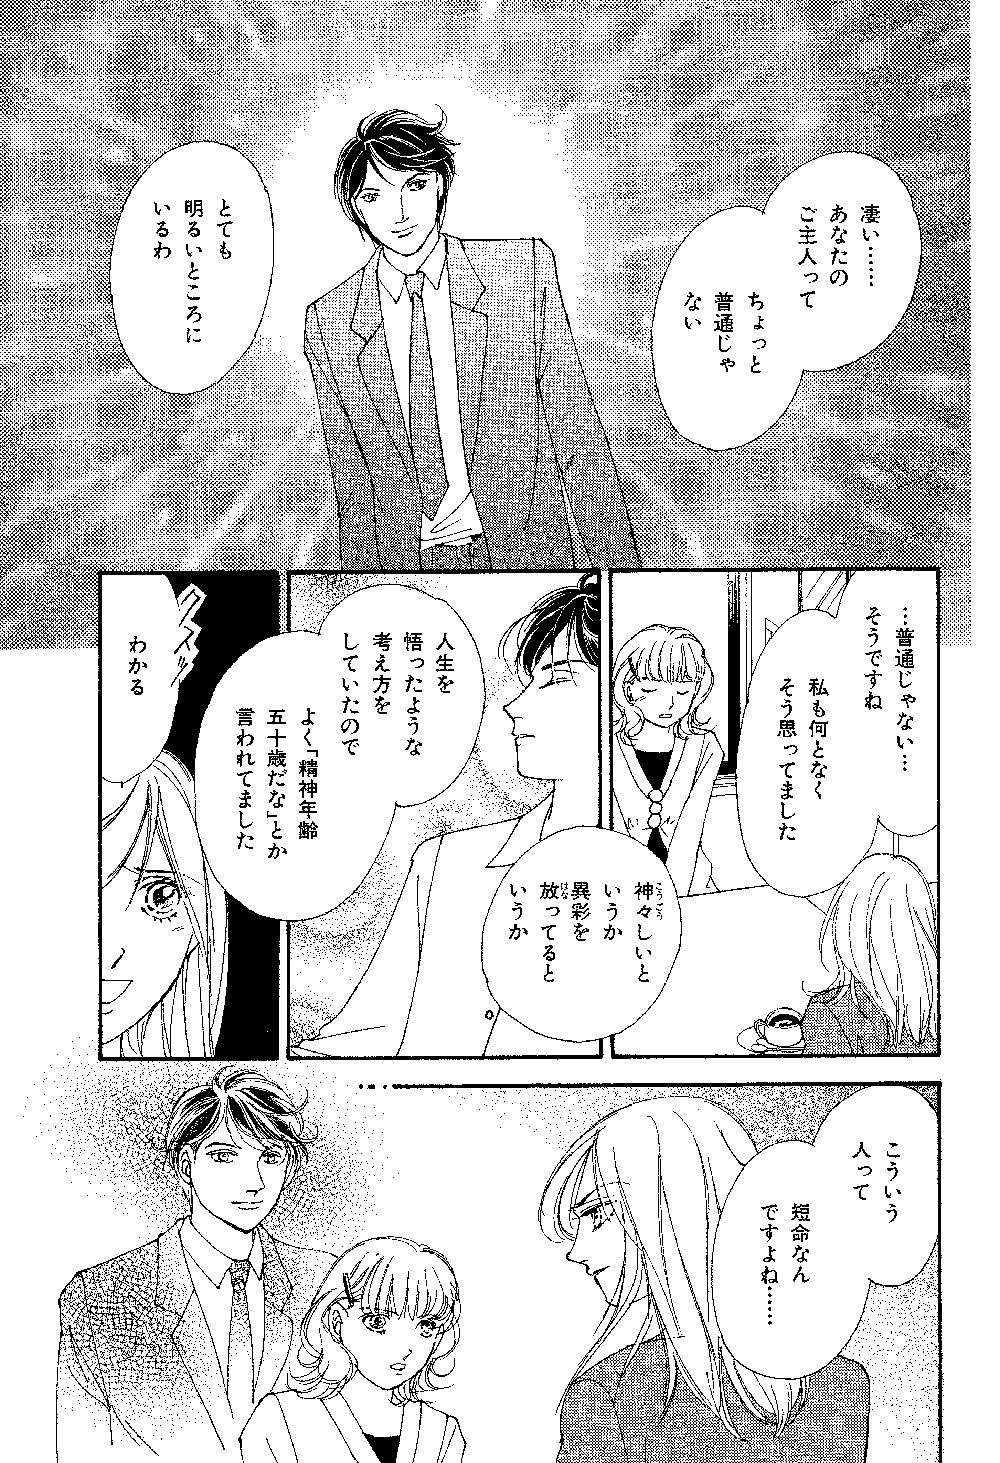 mayuri_0001_0036.jpg